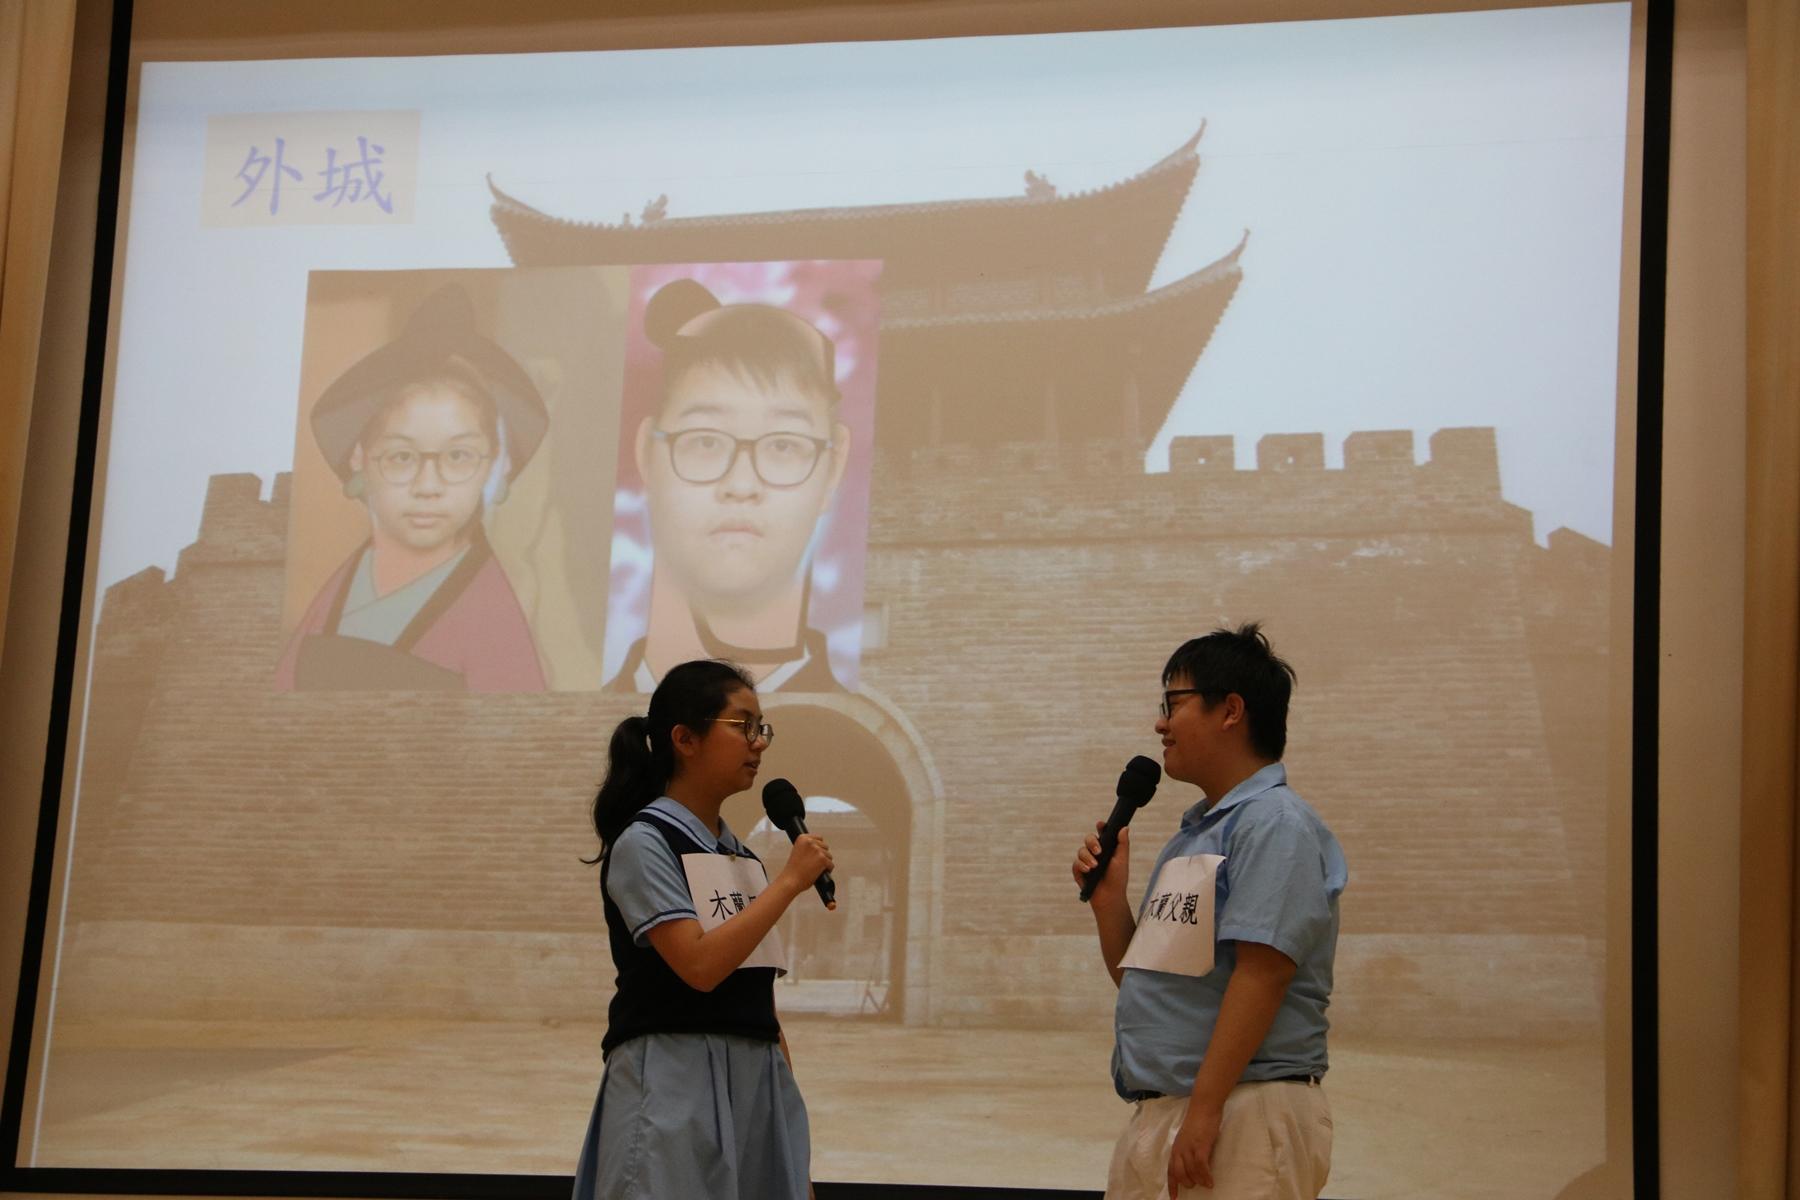 http://npc.edu.hk/sites/default/files/img_3989.jpg